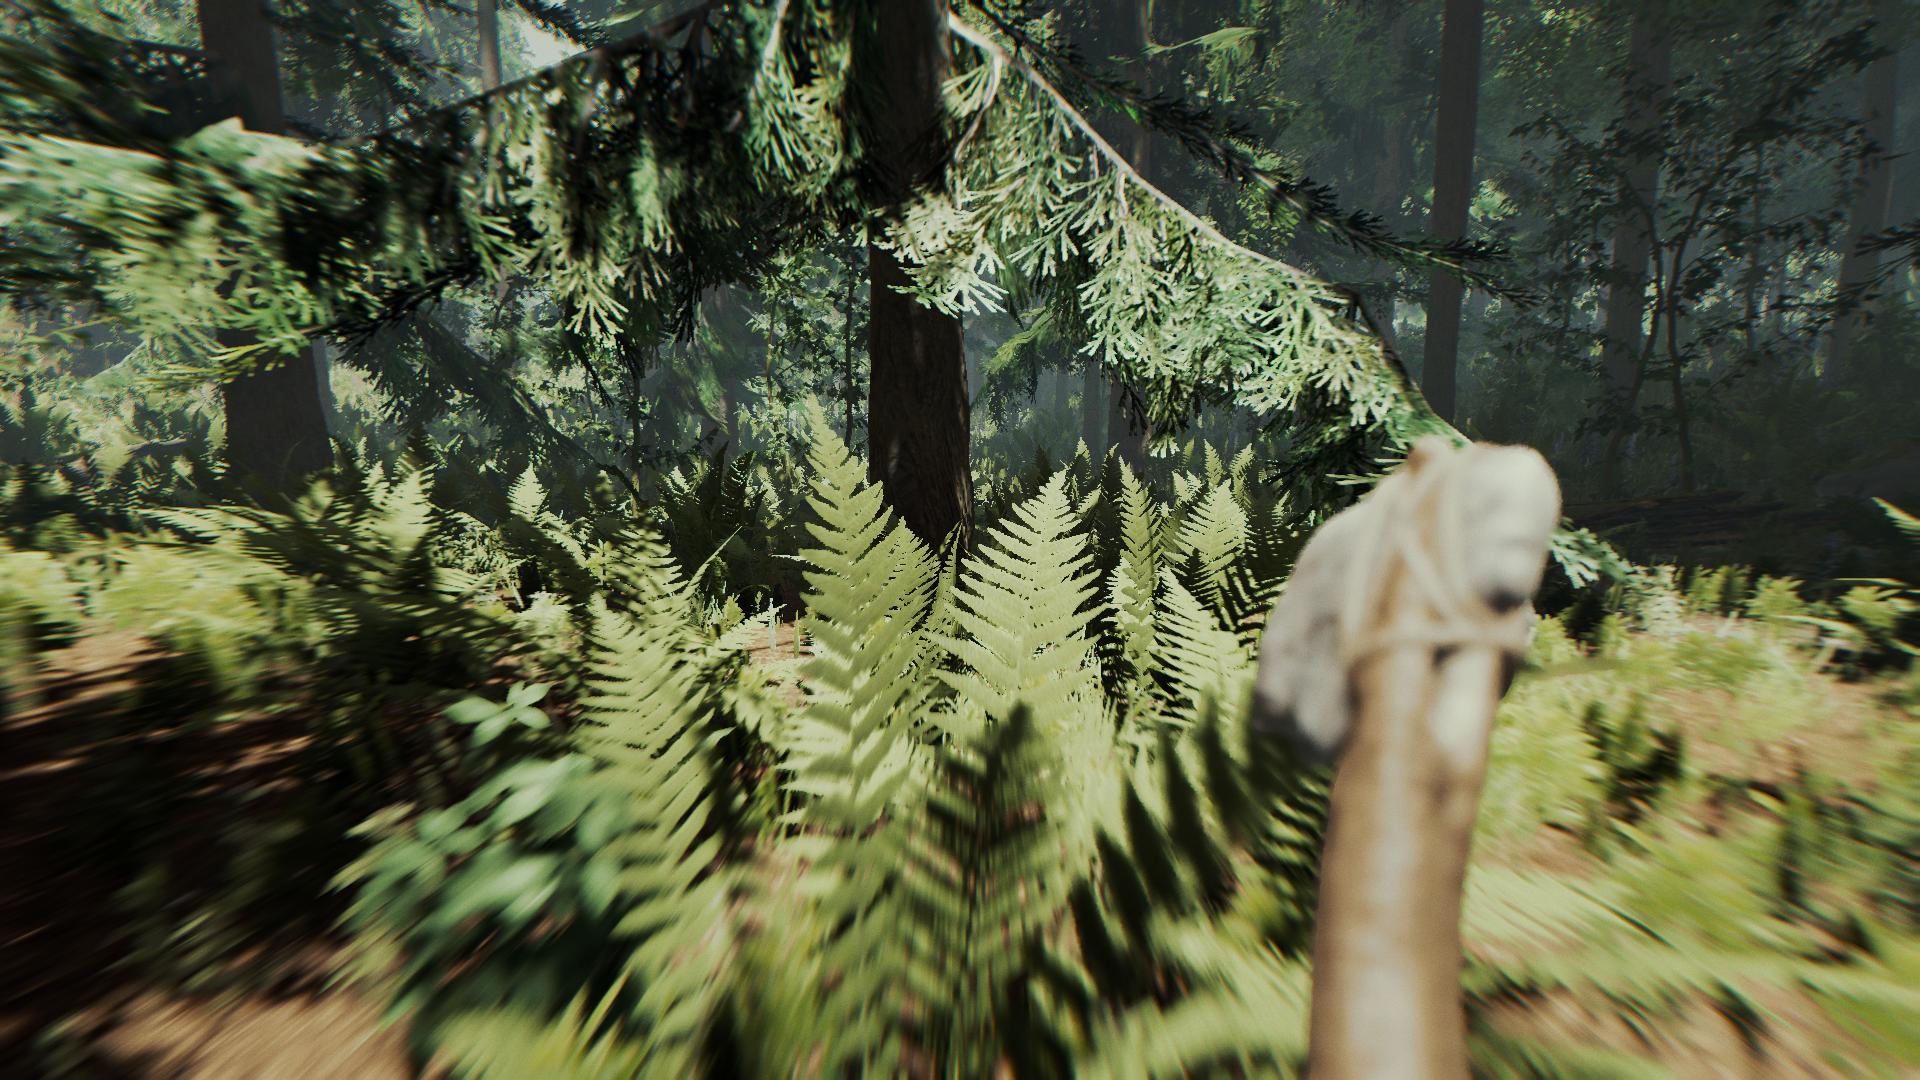 The forest il gioco